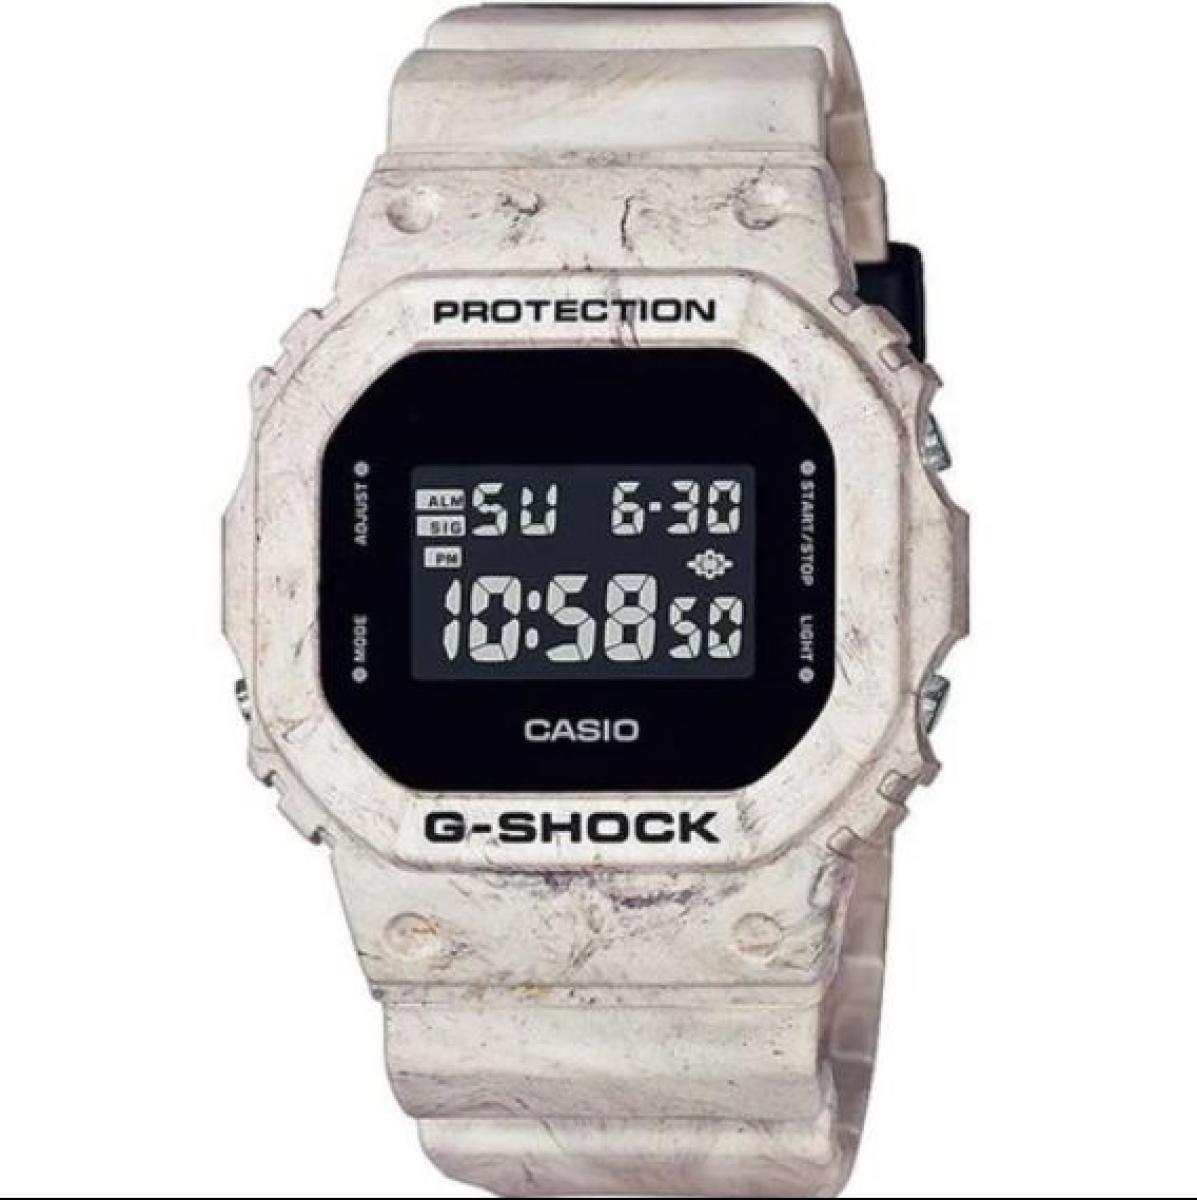 Relogio casio gshock -dw-5600wm-5dr